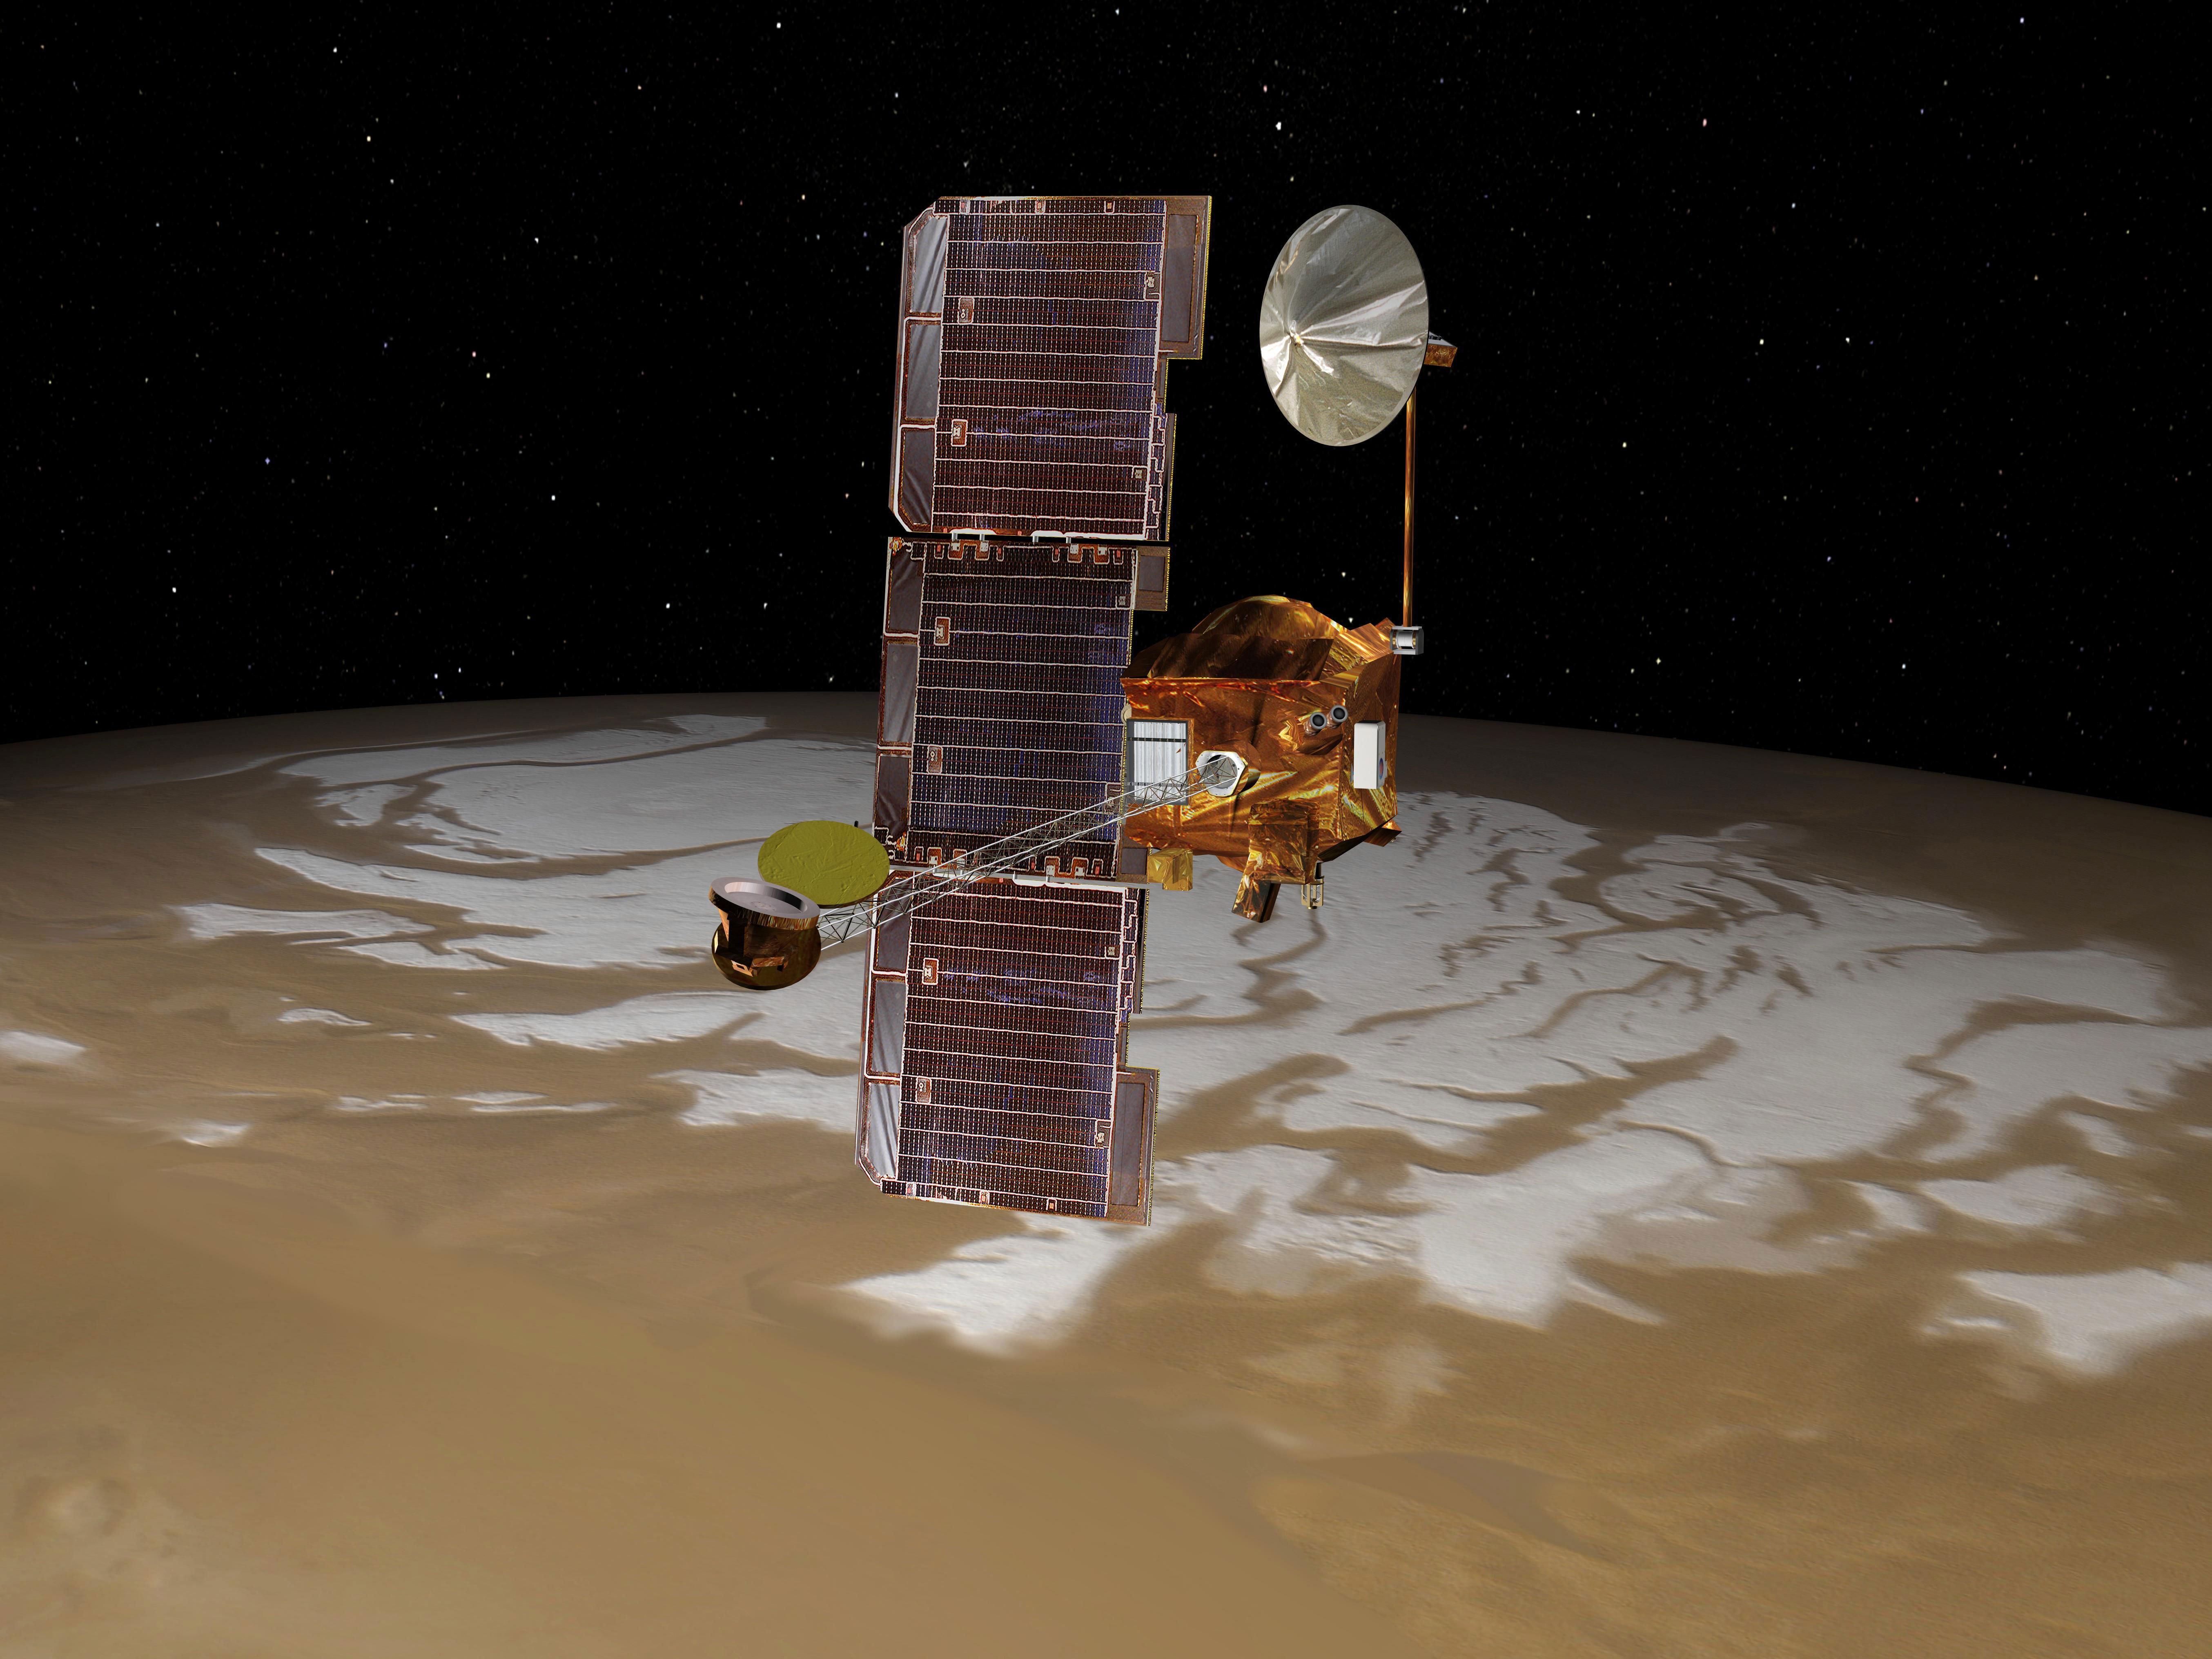 mars one mars odyssey марс одиссей